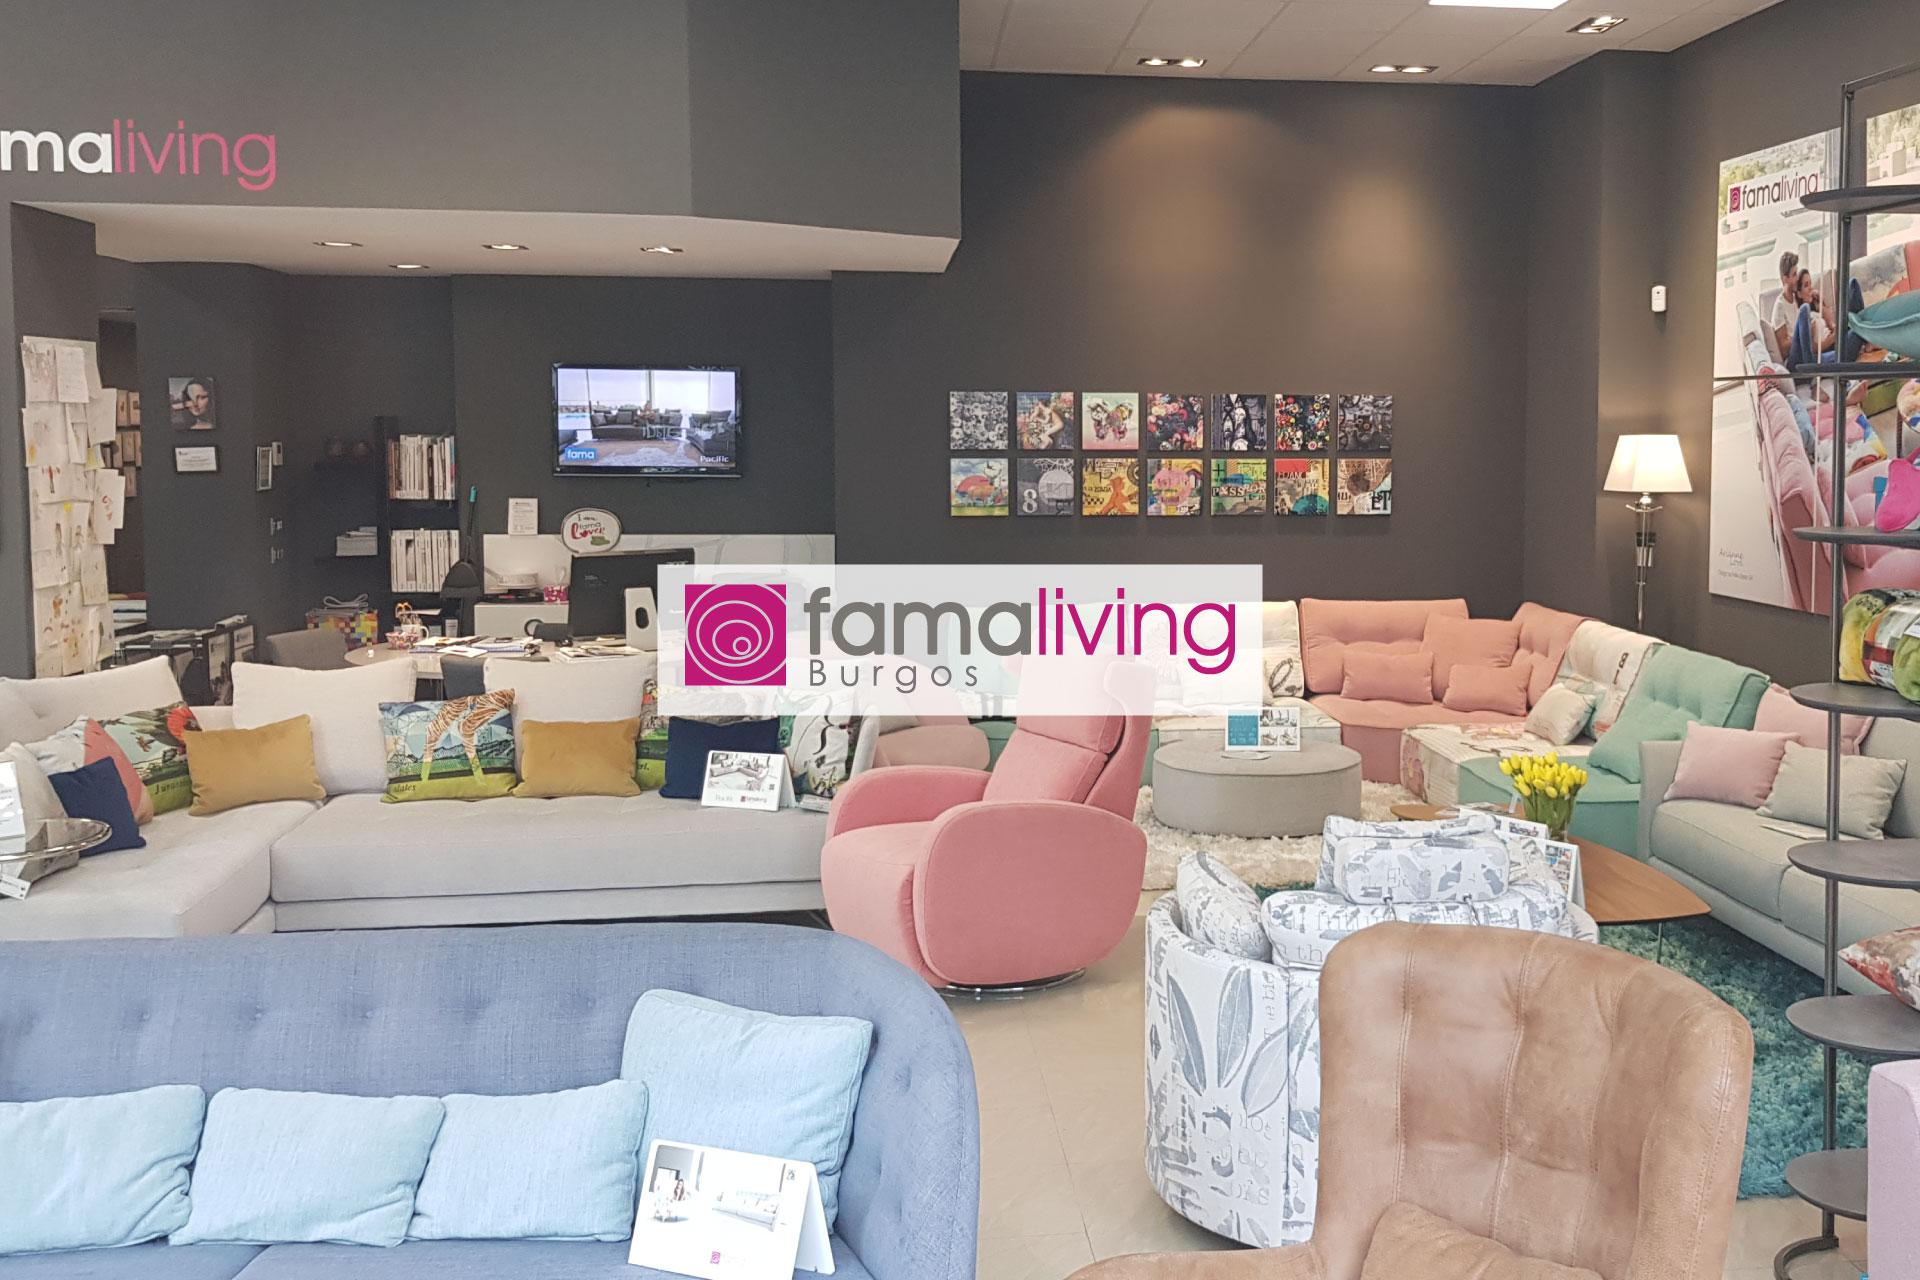 Famaliving Burgos - Sofa Store